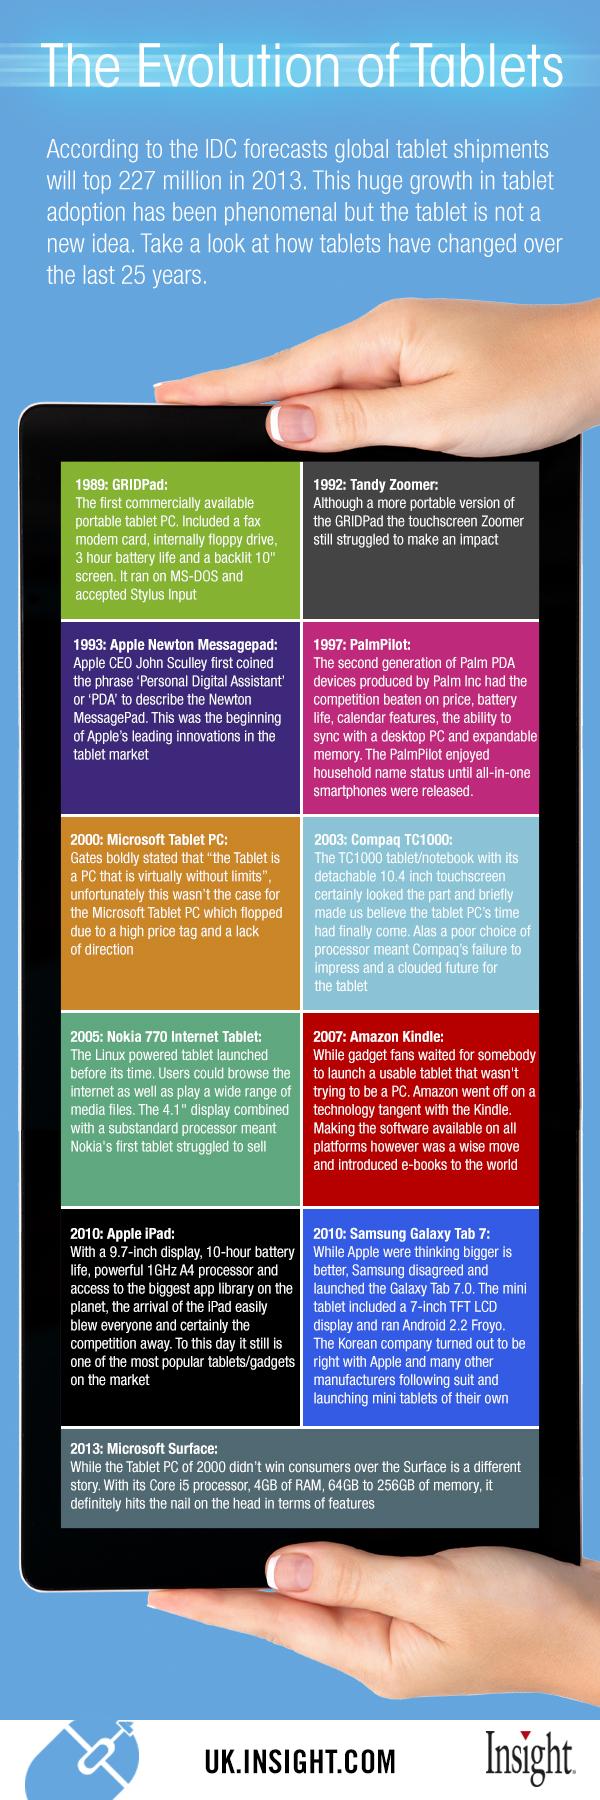 Tablet PC Evolution-Infographic